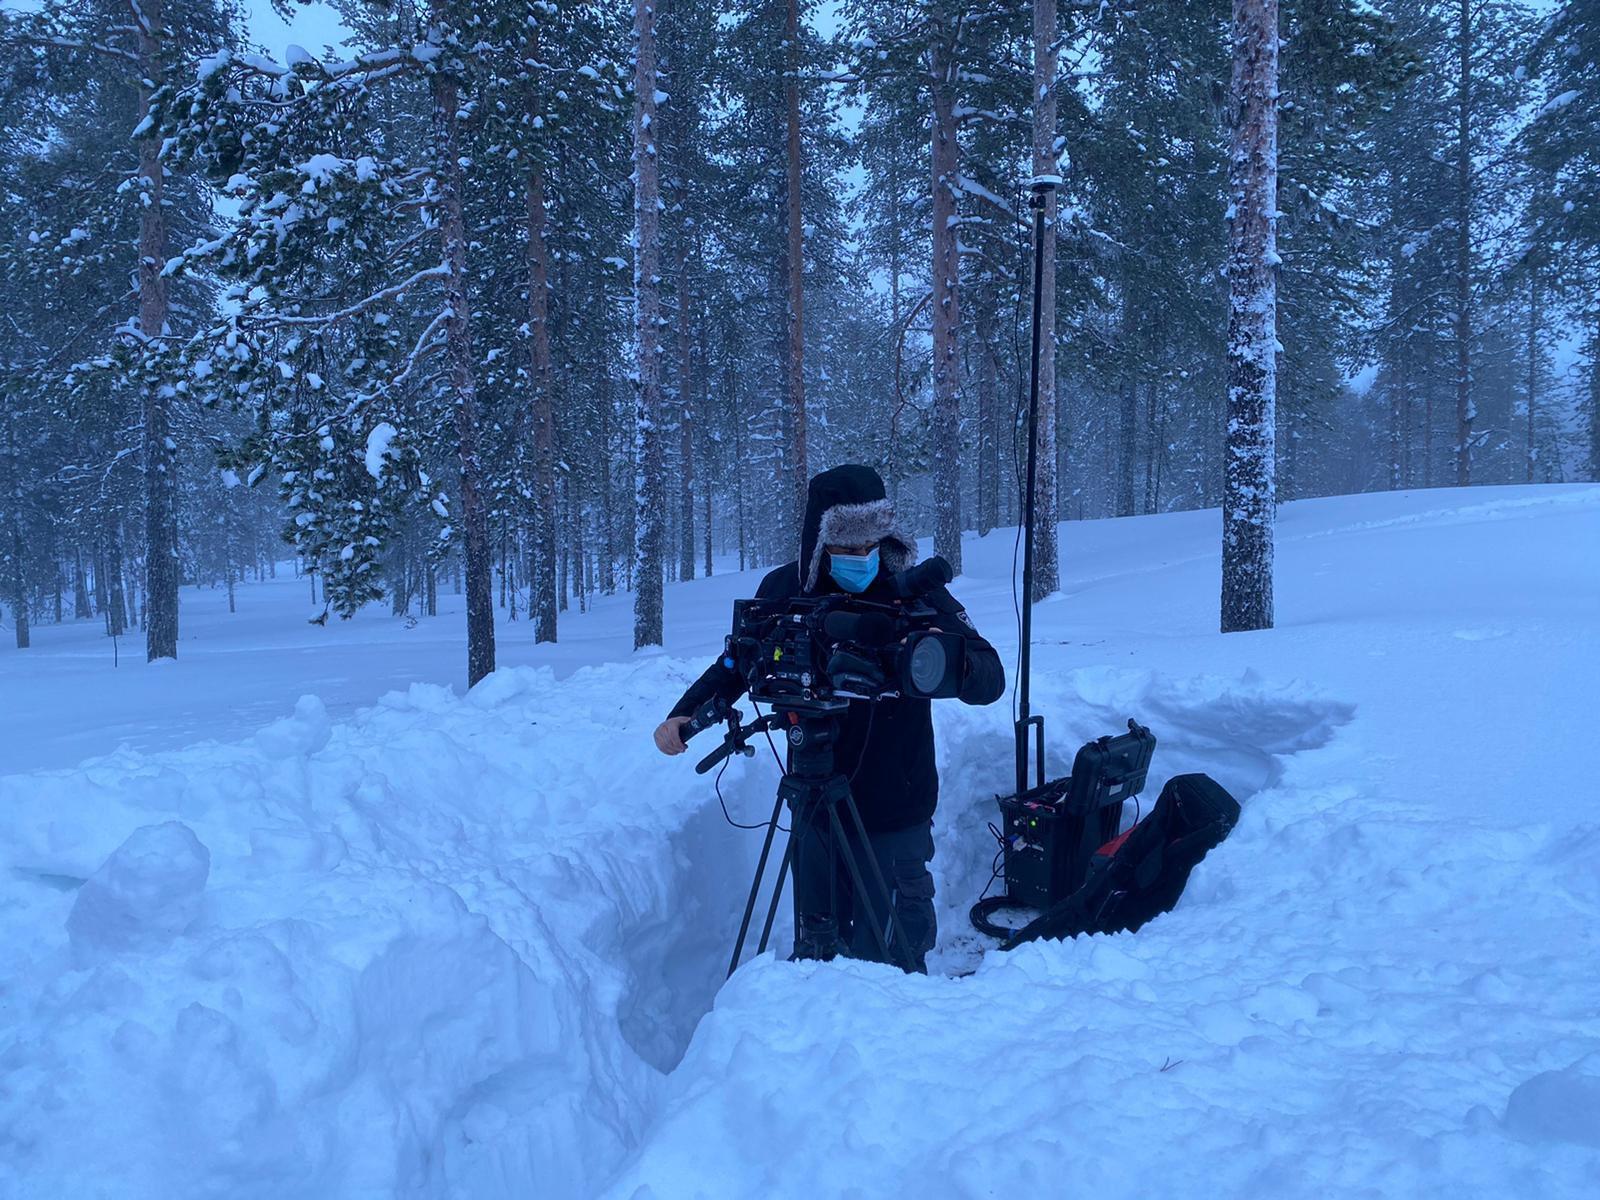 WRC: Arctic Rally Finland - Powered by CapitalBox [26-28 Febrero] - Página 2 EvImwhfXIAEHGzK?format=jpg&name=large